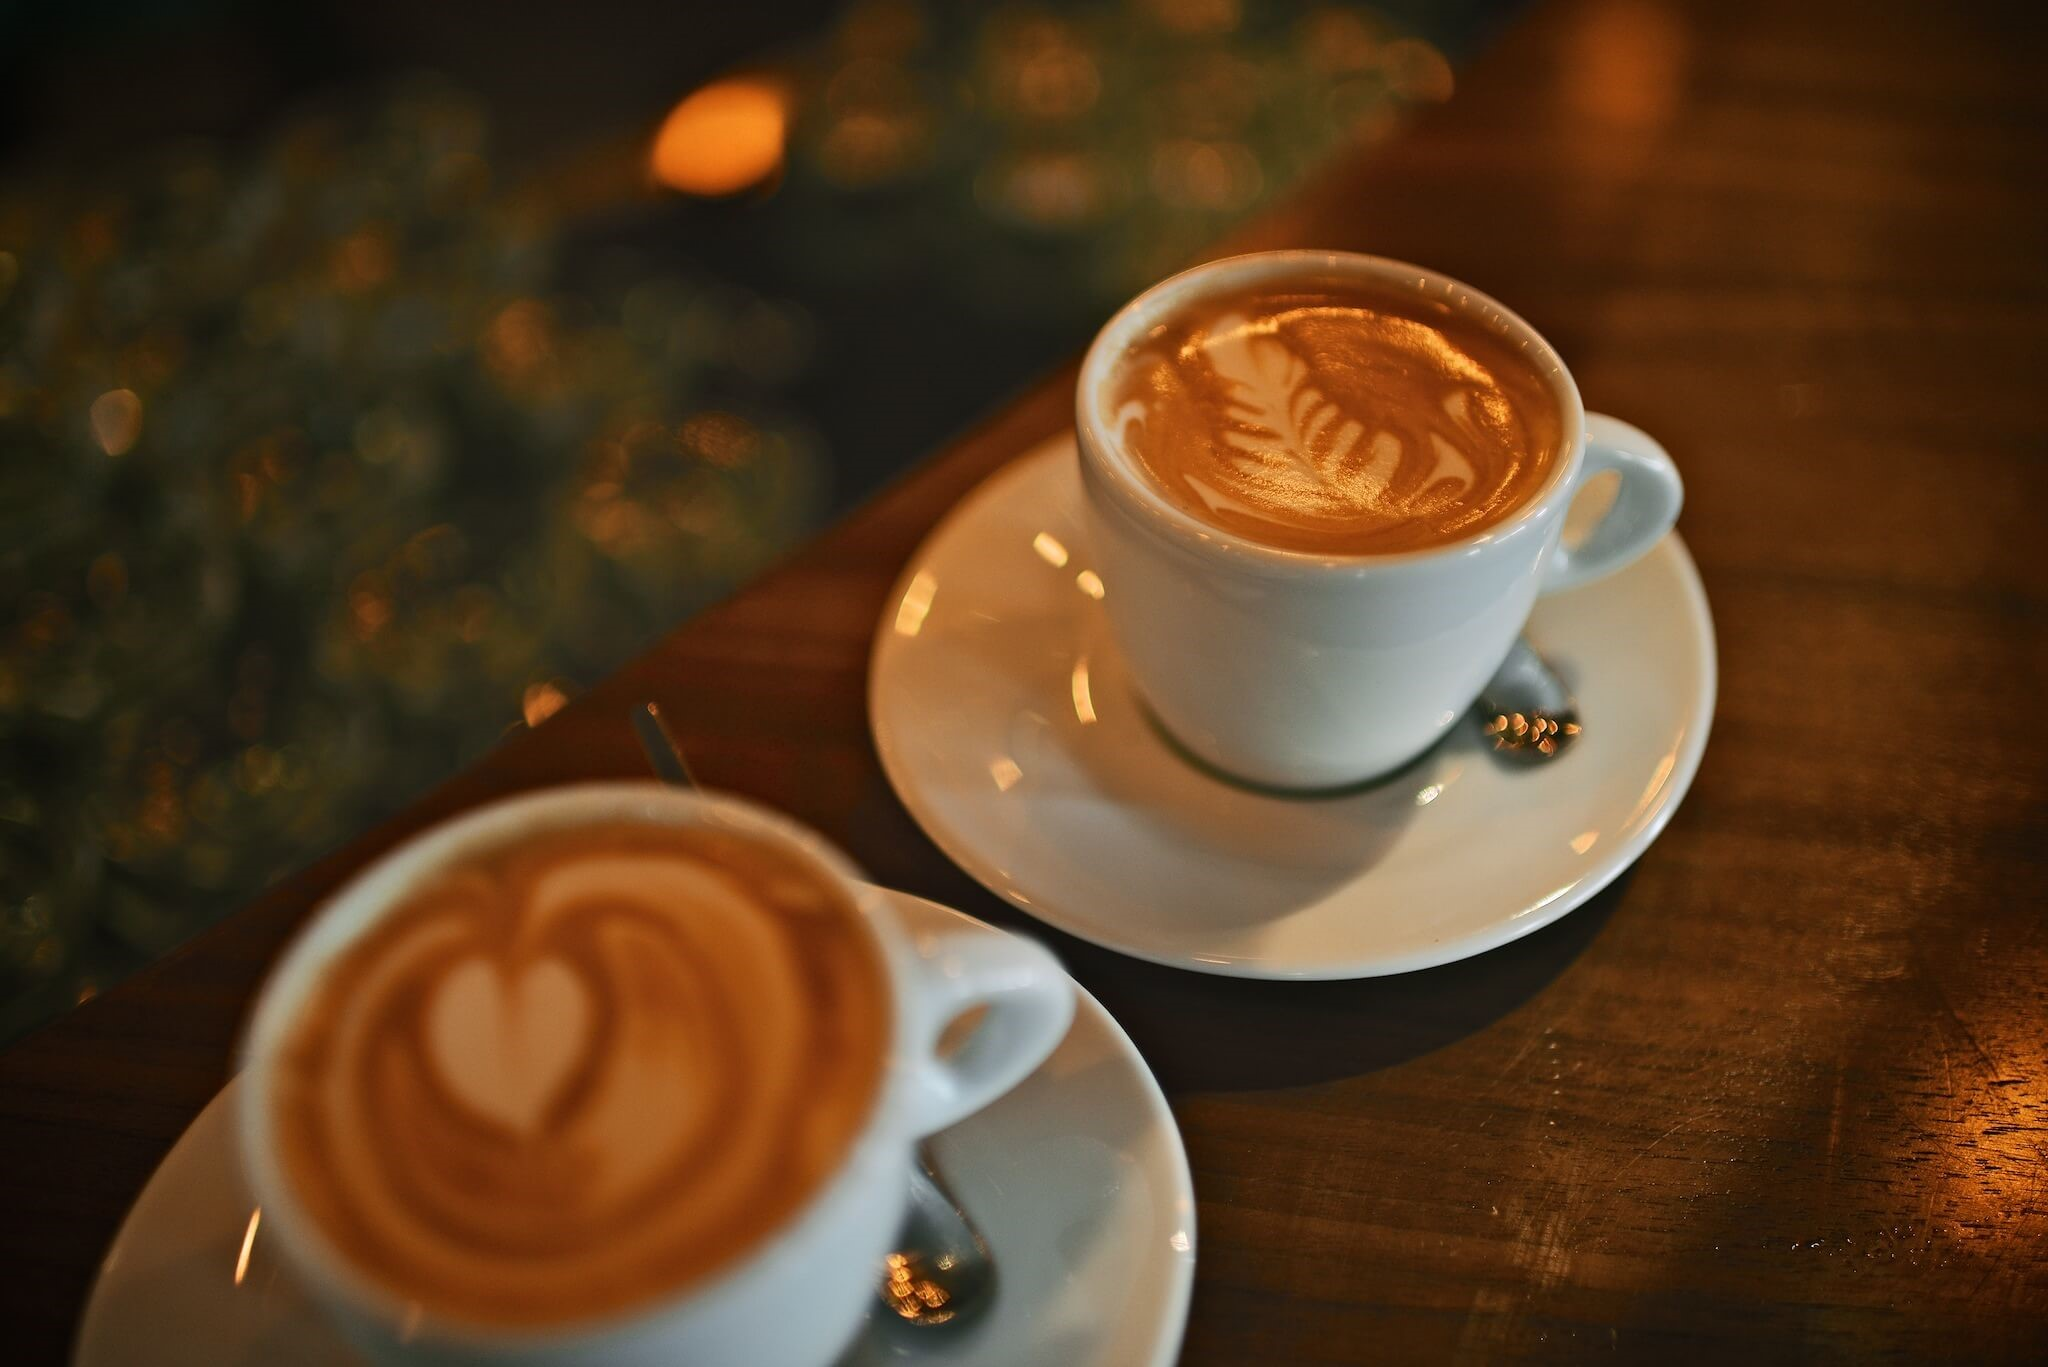 Kava smanjuje rizik od bolesti jetre, tri do četiri šalice dnevno